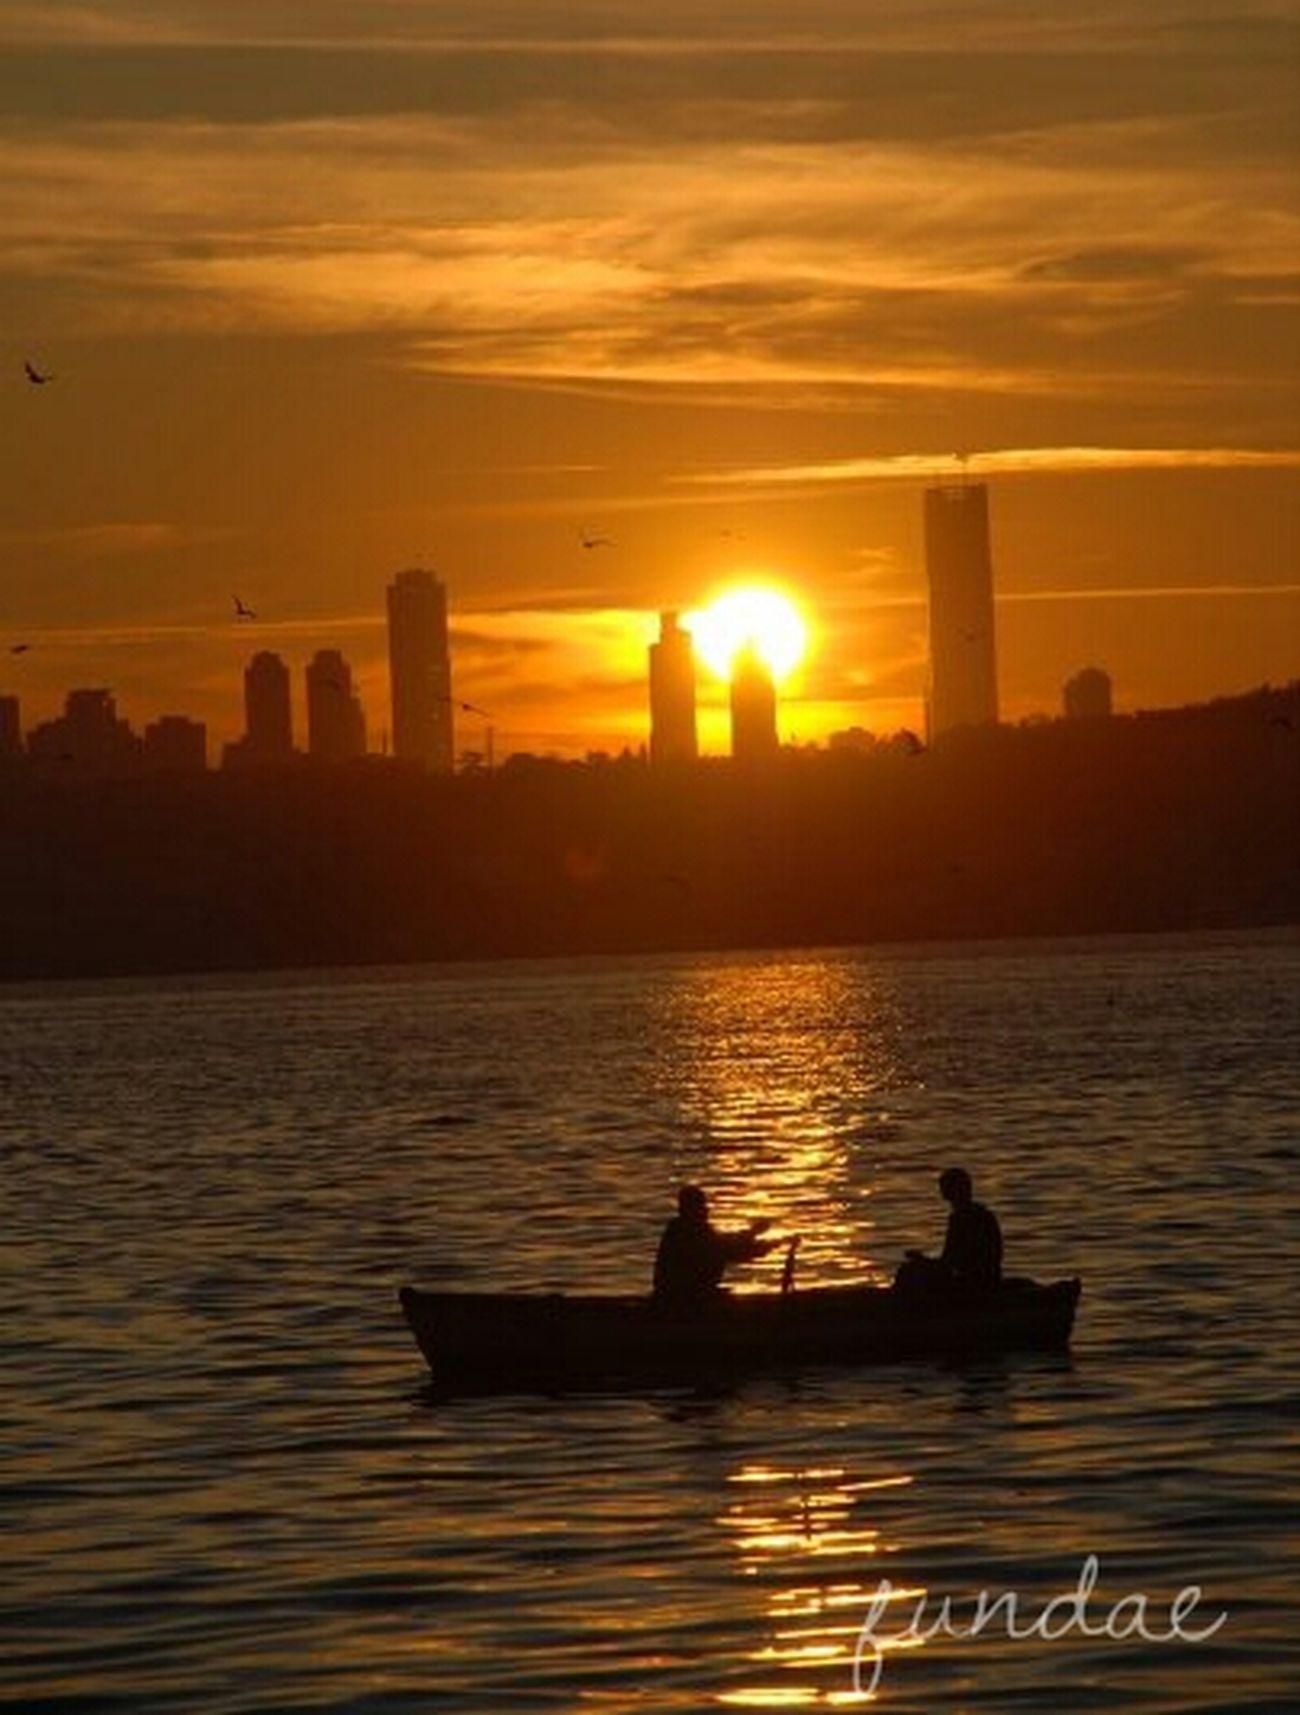 Sunset Bosphorus Sunset Istanbullovers Istanbul - Bosphorus